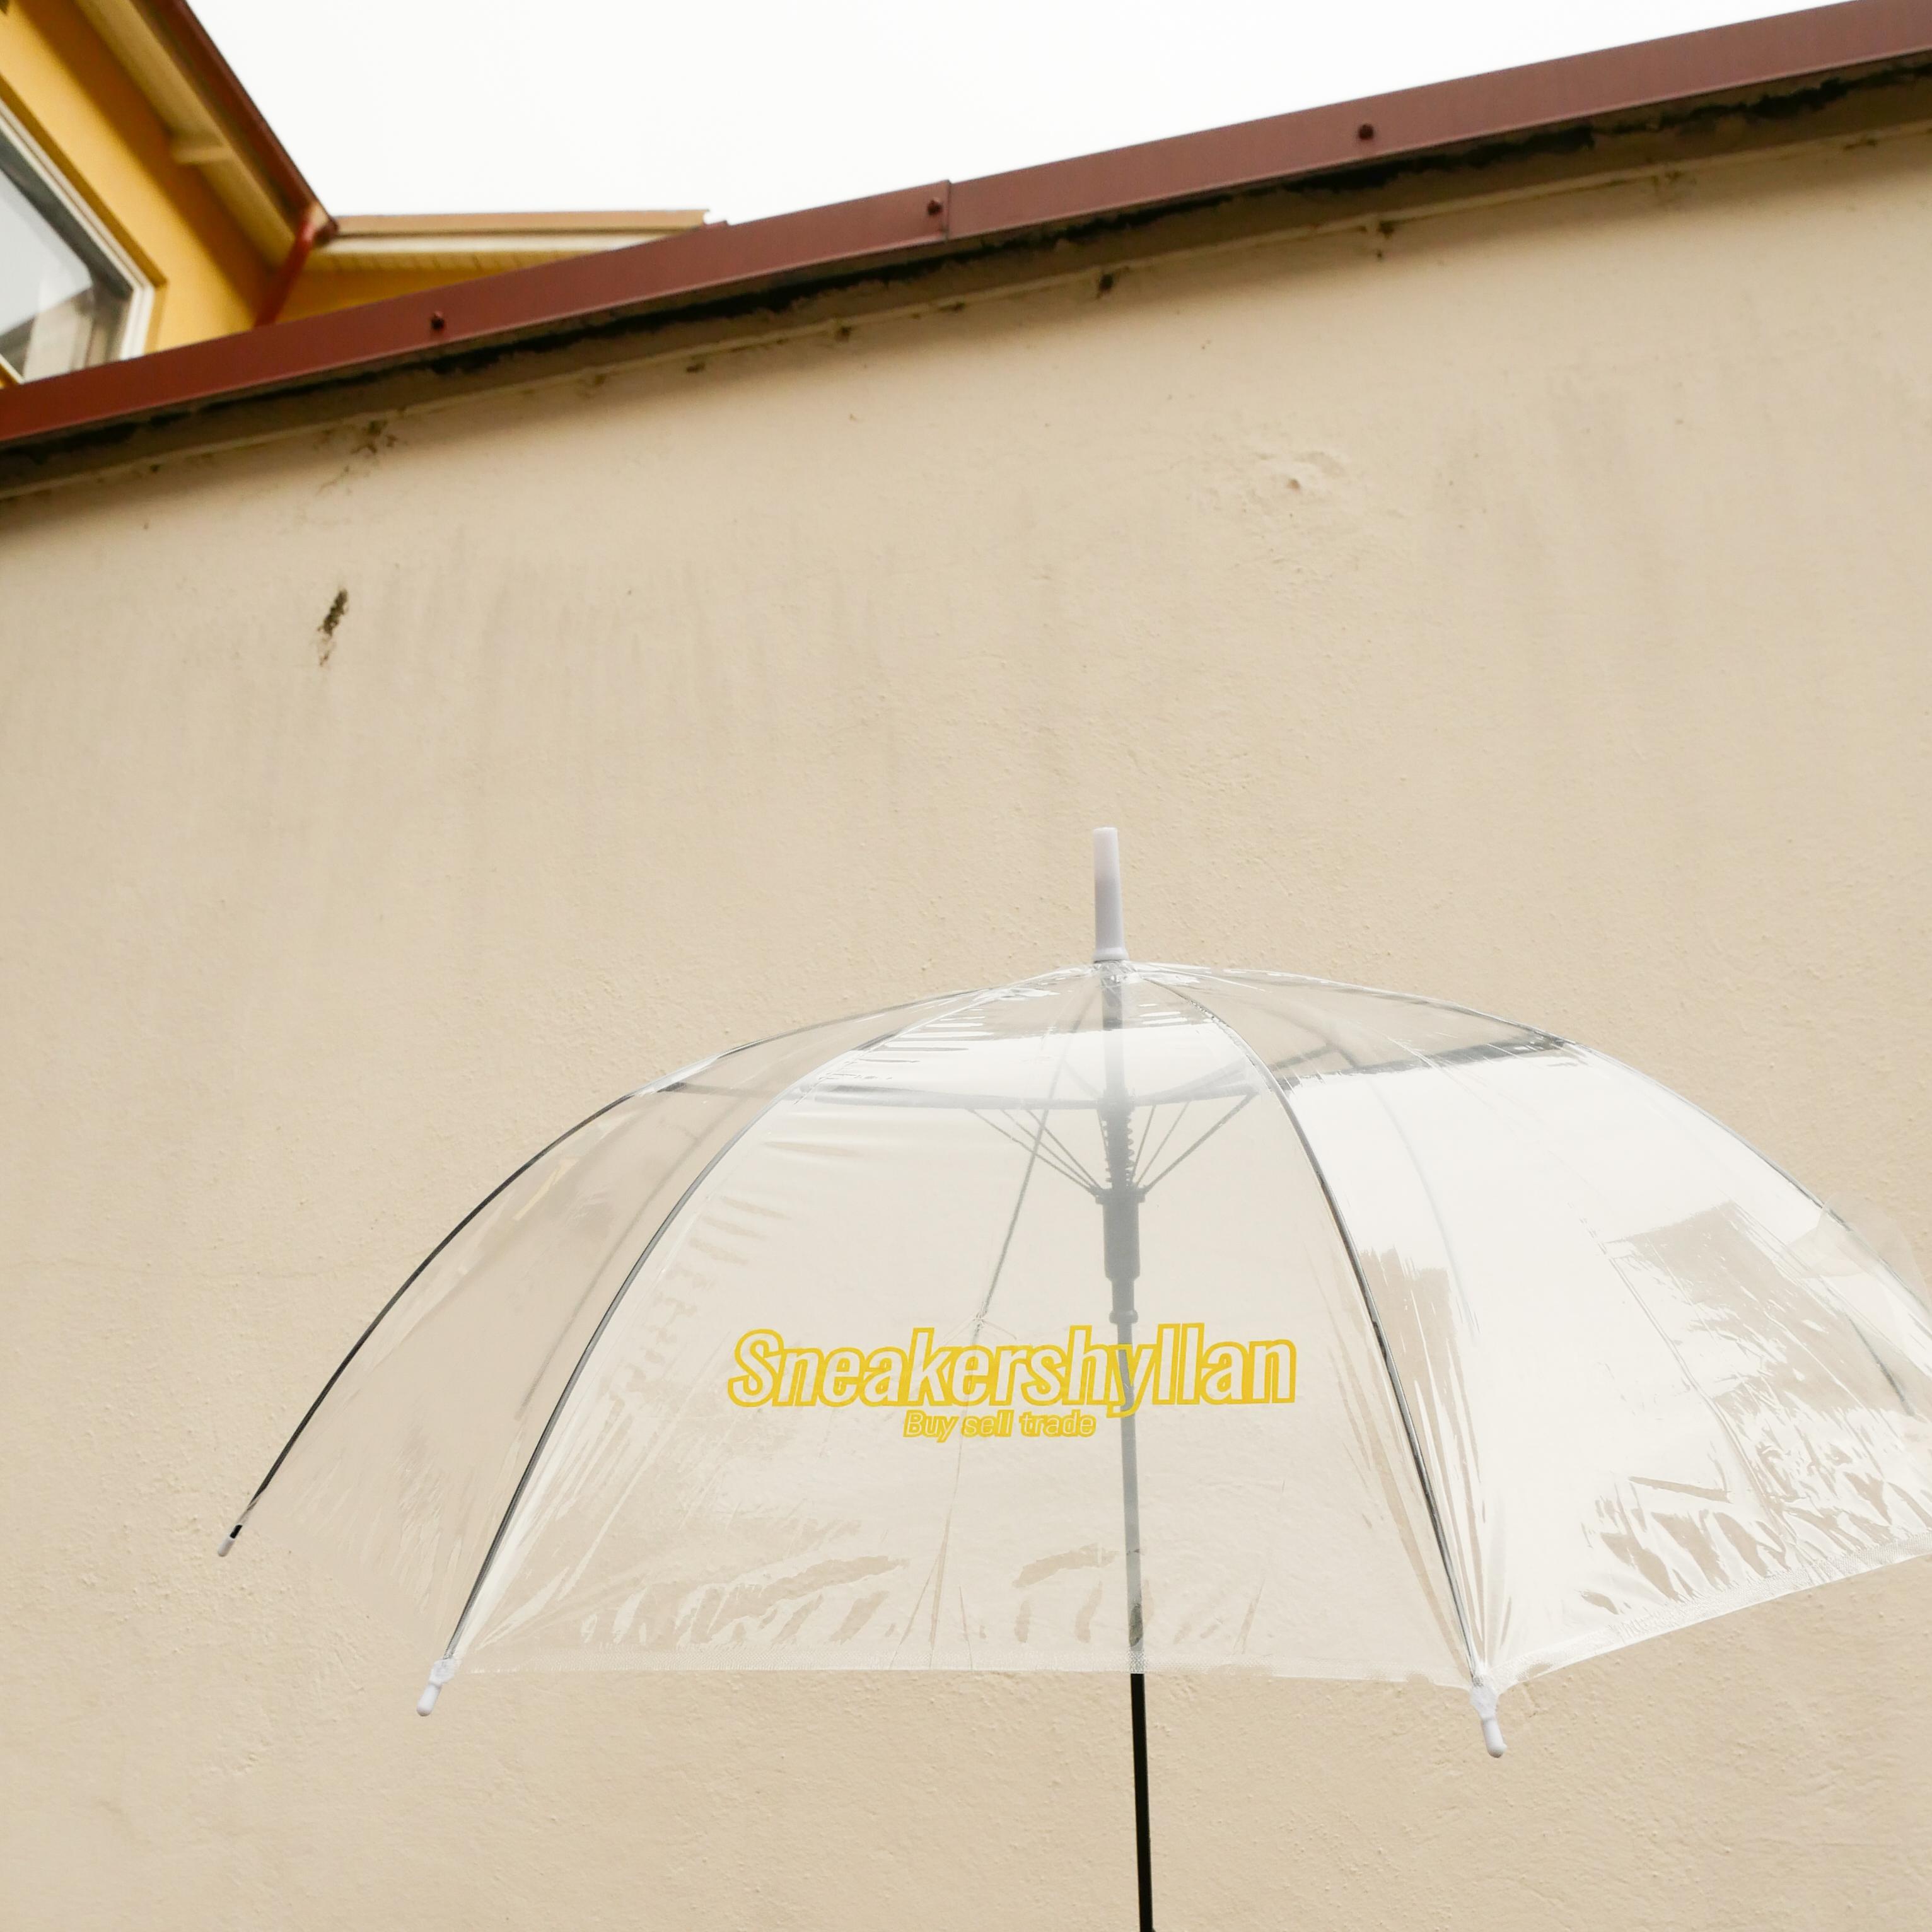 Sneakershyllan Transparent Umbrella